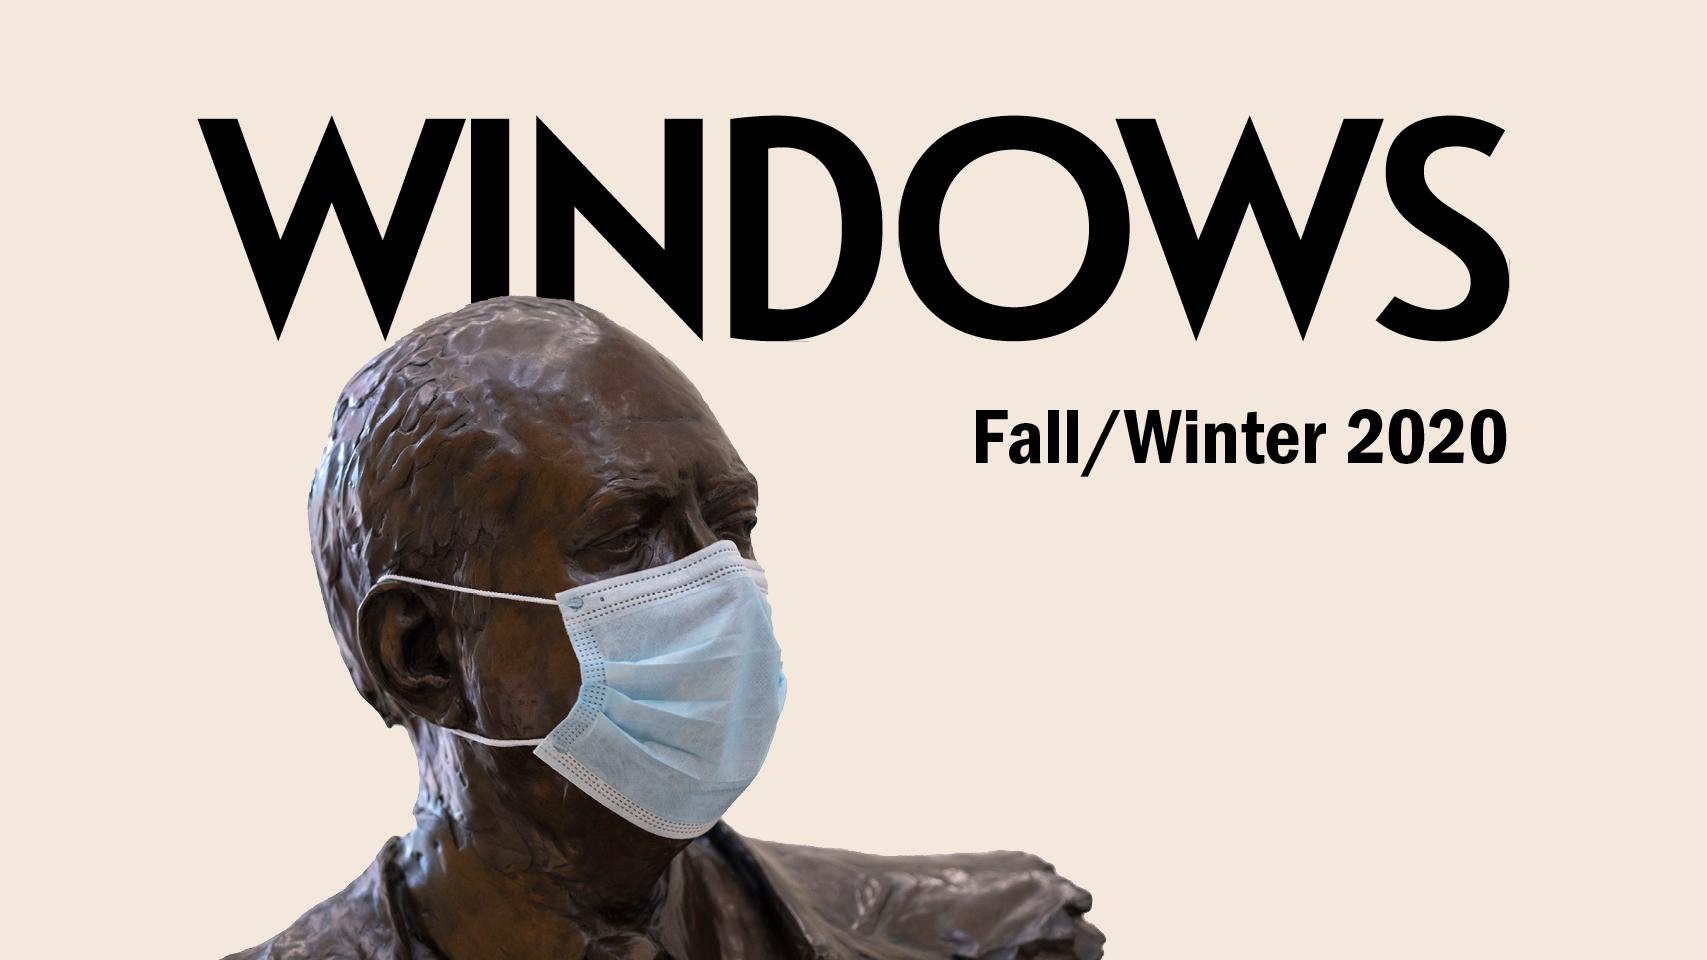 Windows Fall/Winter 2020